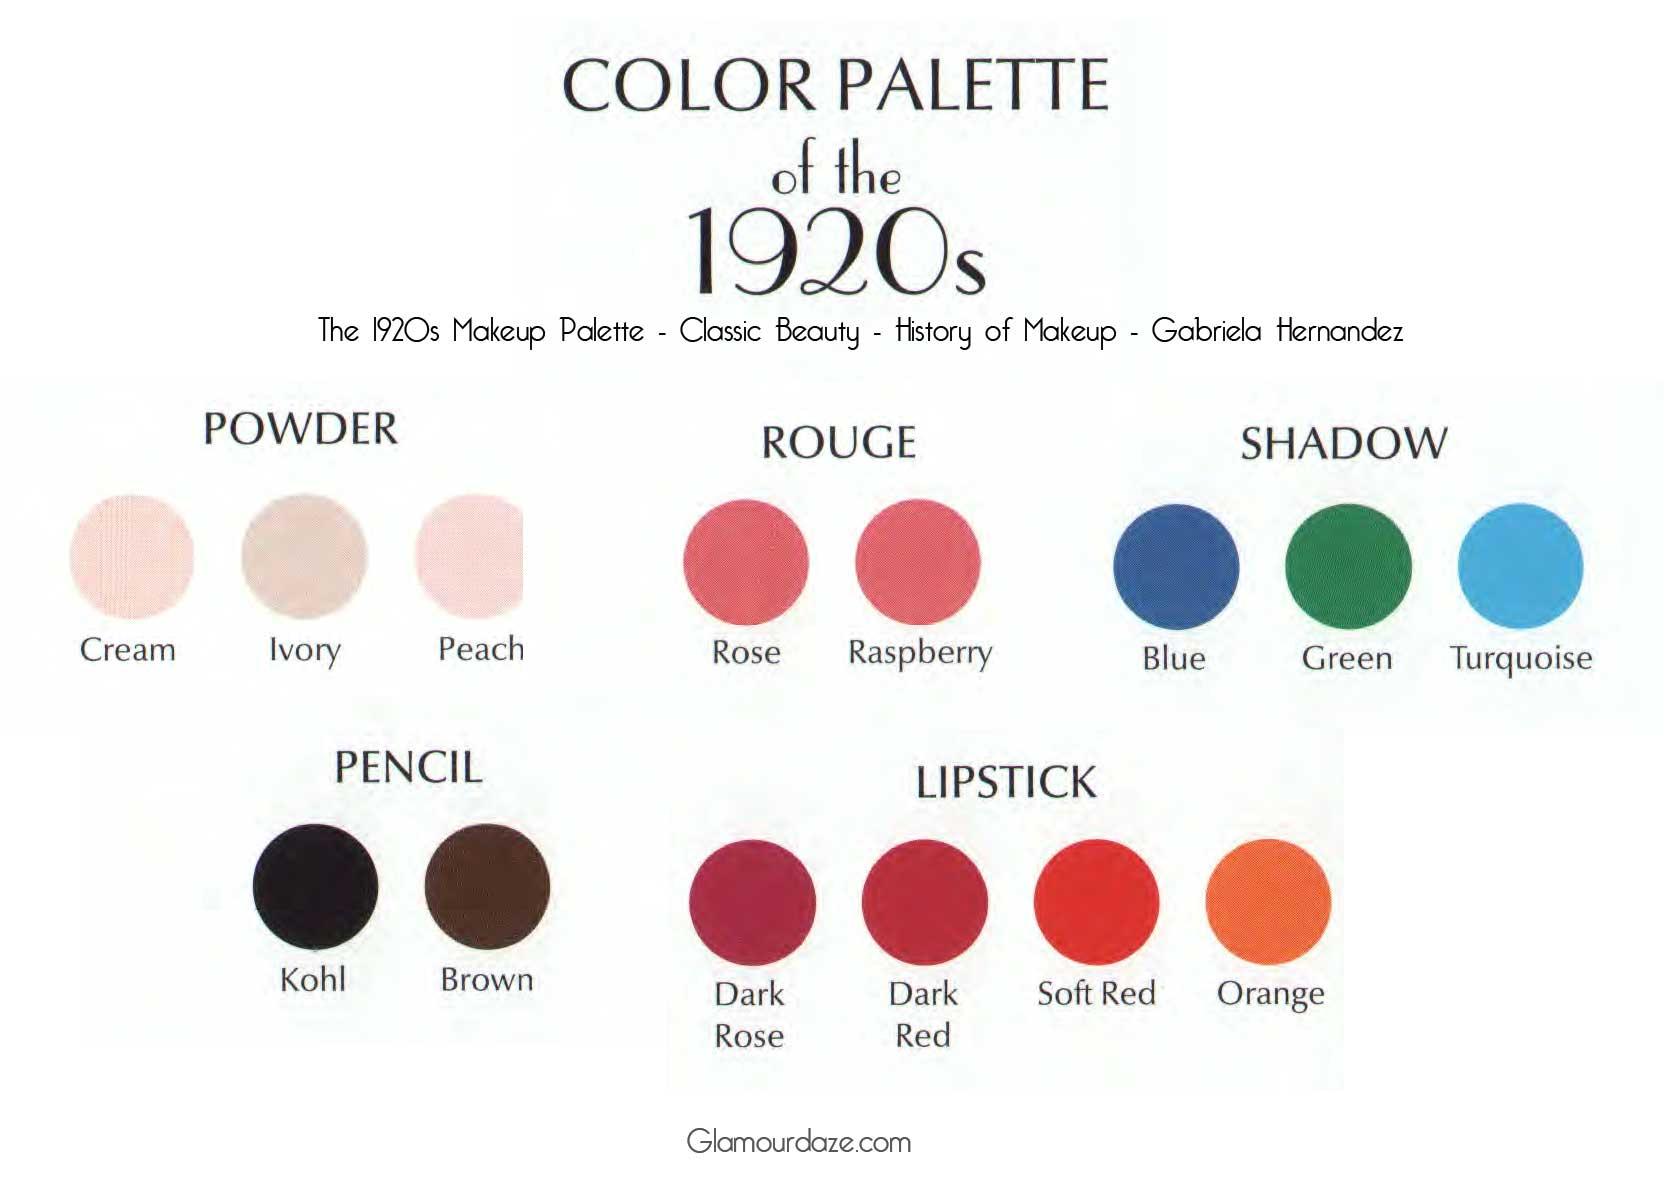 1920s-Makeup-Palette---History-of-makeup-Gabriela-Hernandez---